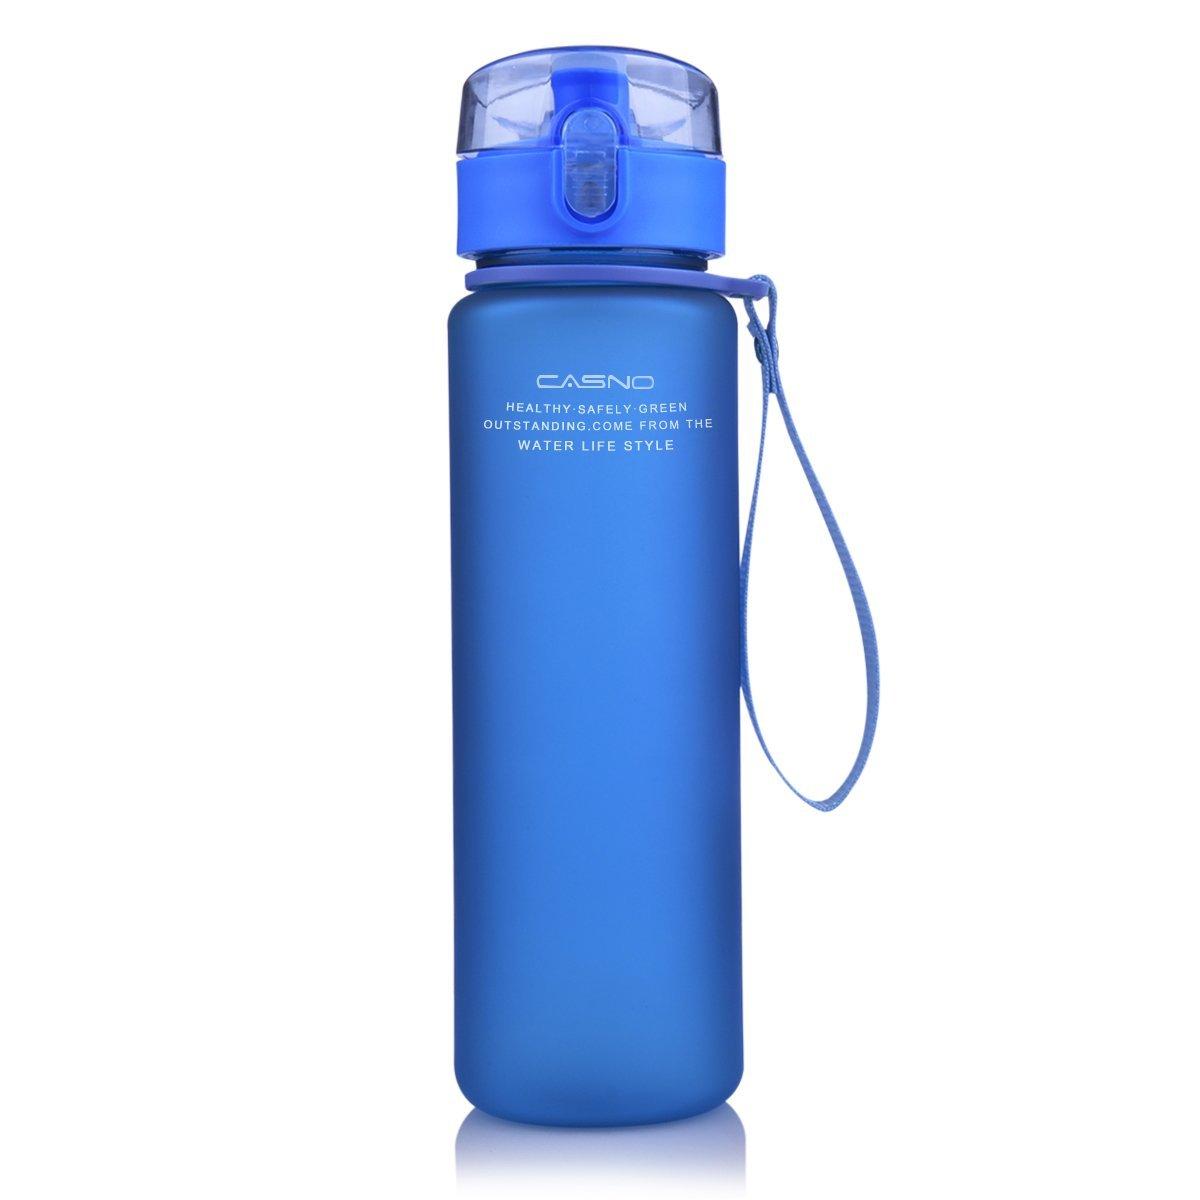 Steel Bottle for Water Outdoor Yoga Camping Hiking princess Disney Water Bottle 18 Oz Disney Sport Bottle Cycling Bottle Travel Flask Stainless Steel